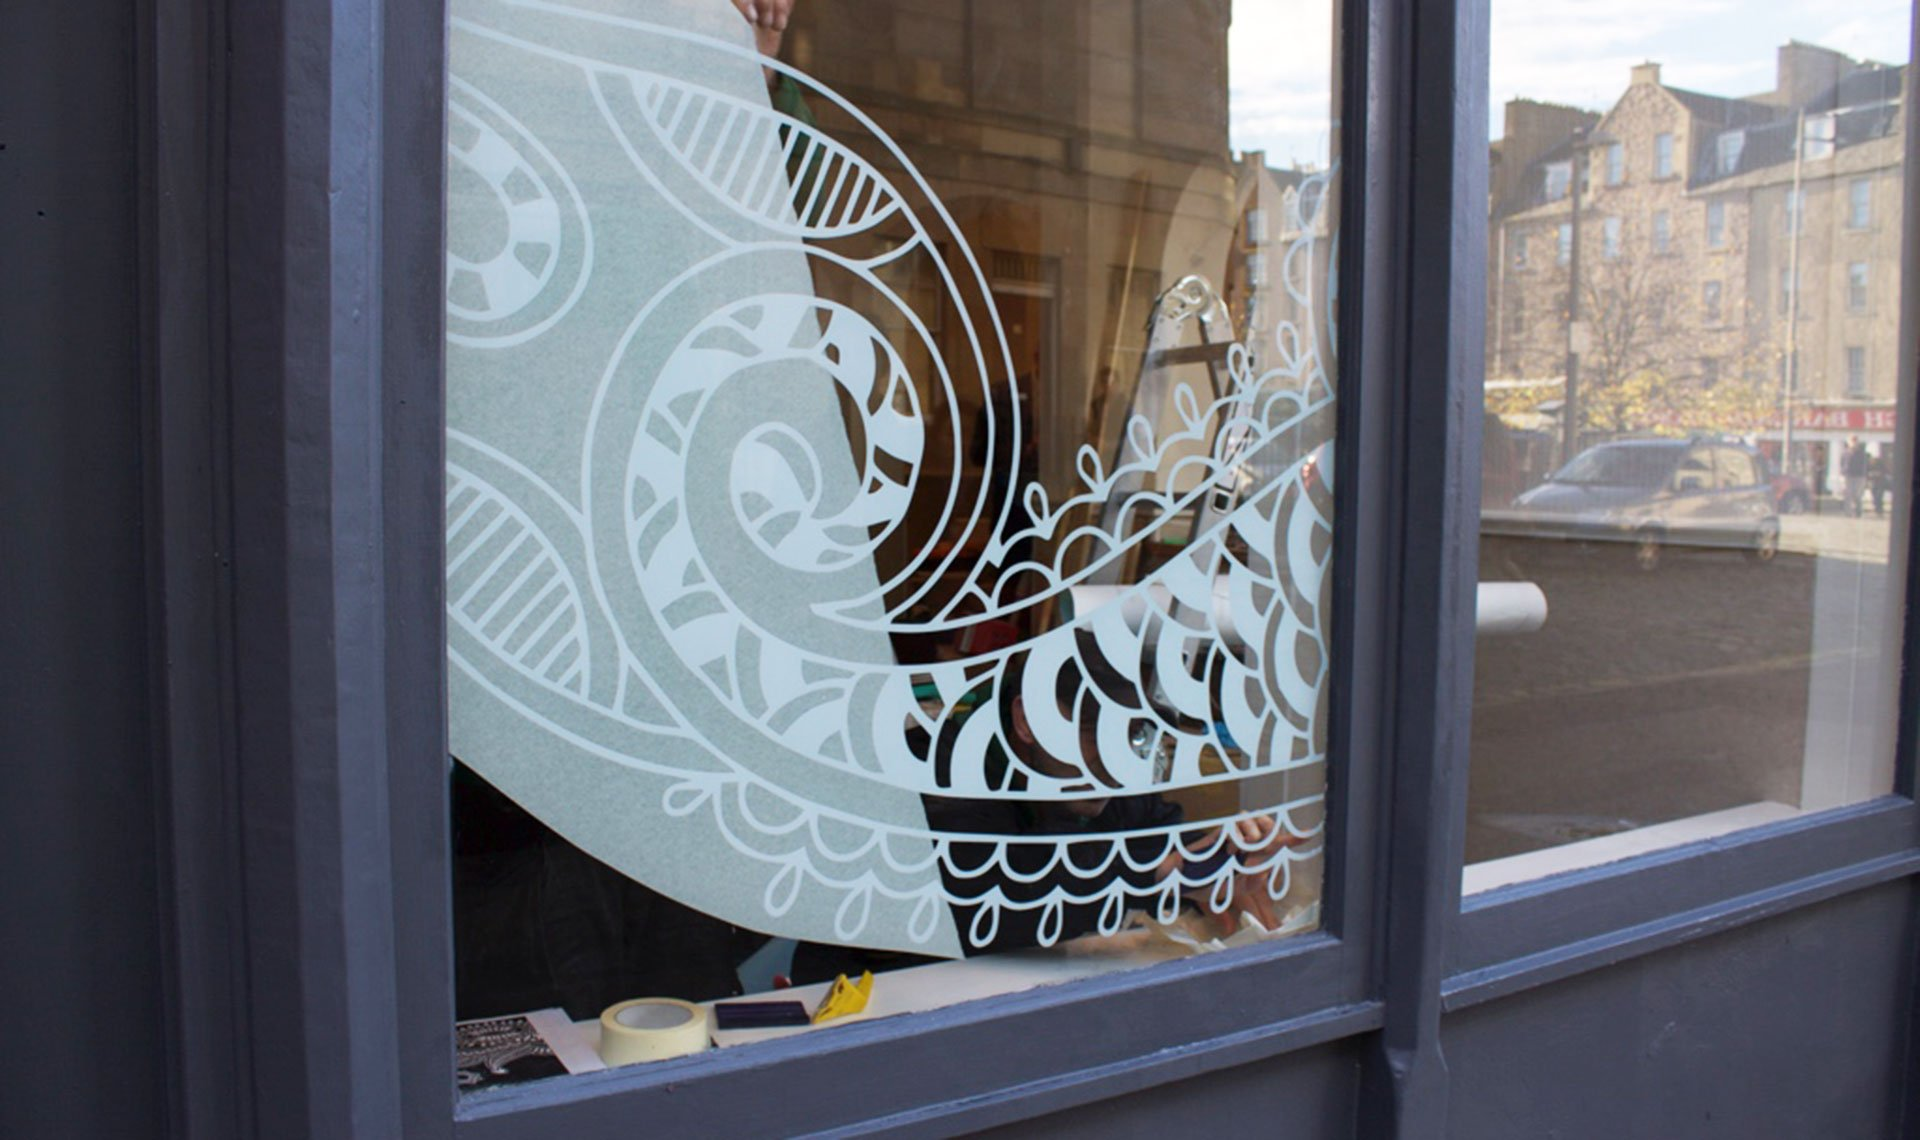 Bindi design painted on window inspired by henna artwork